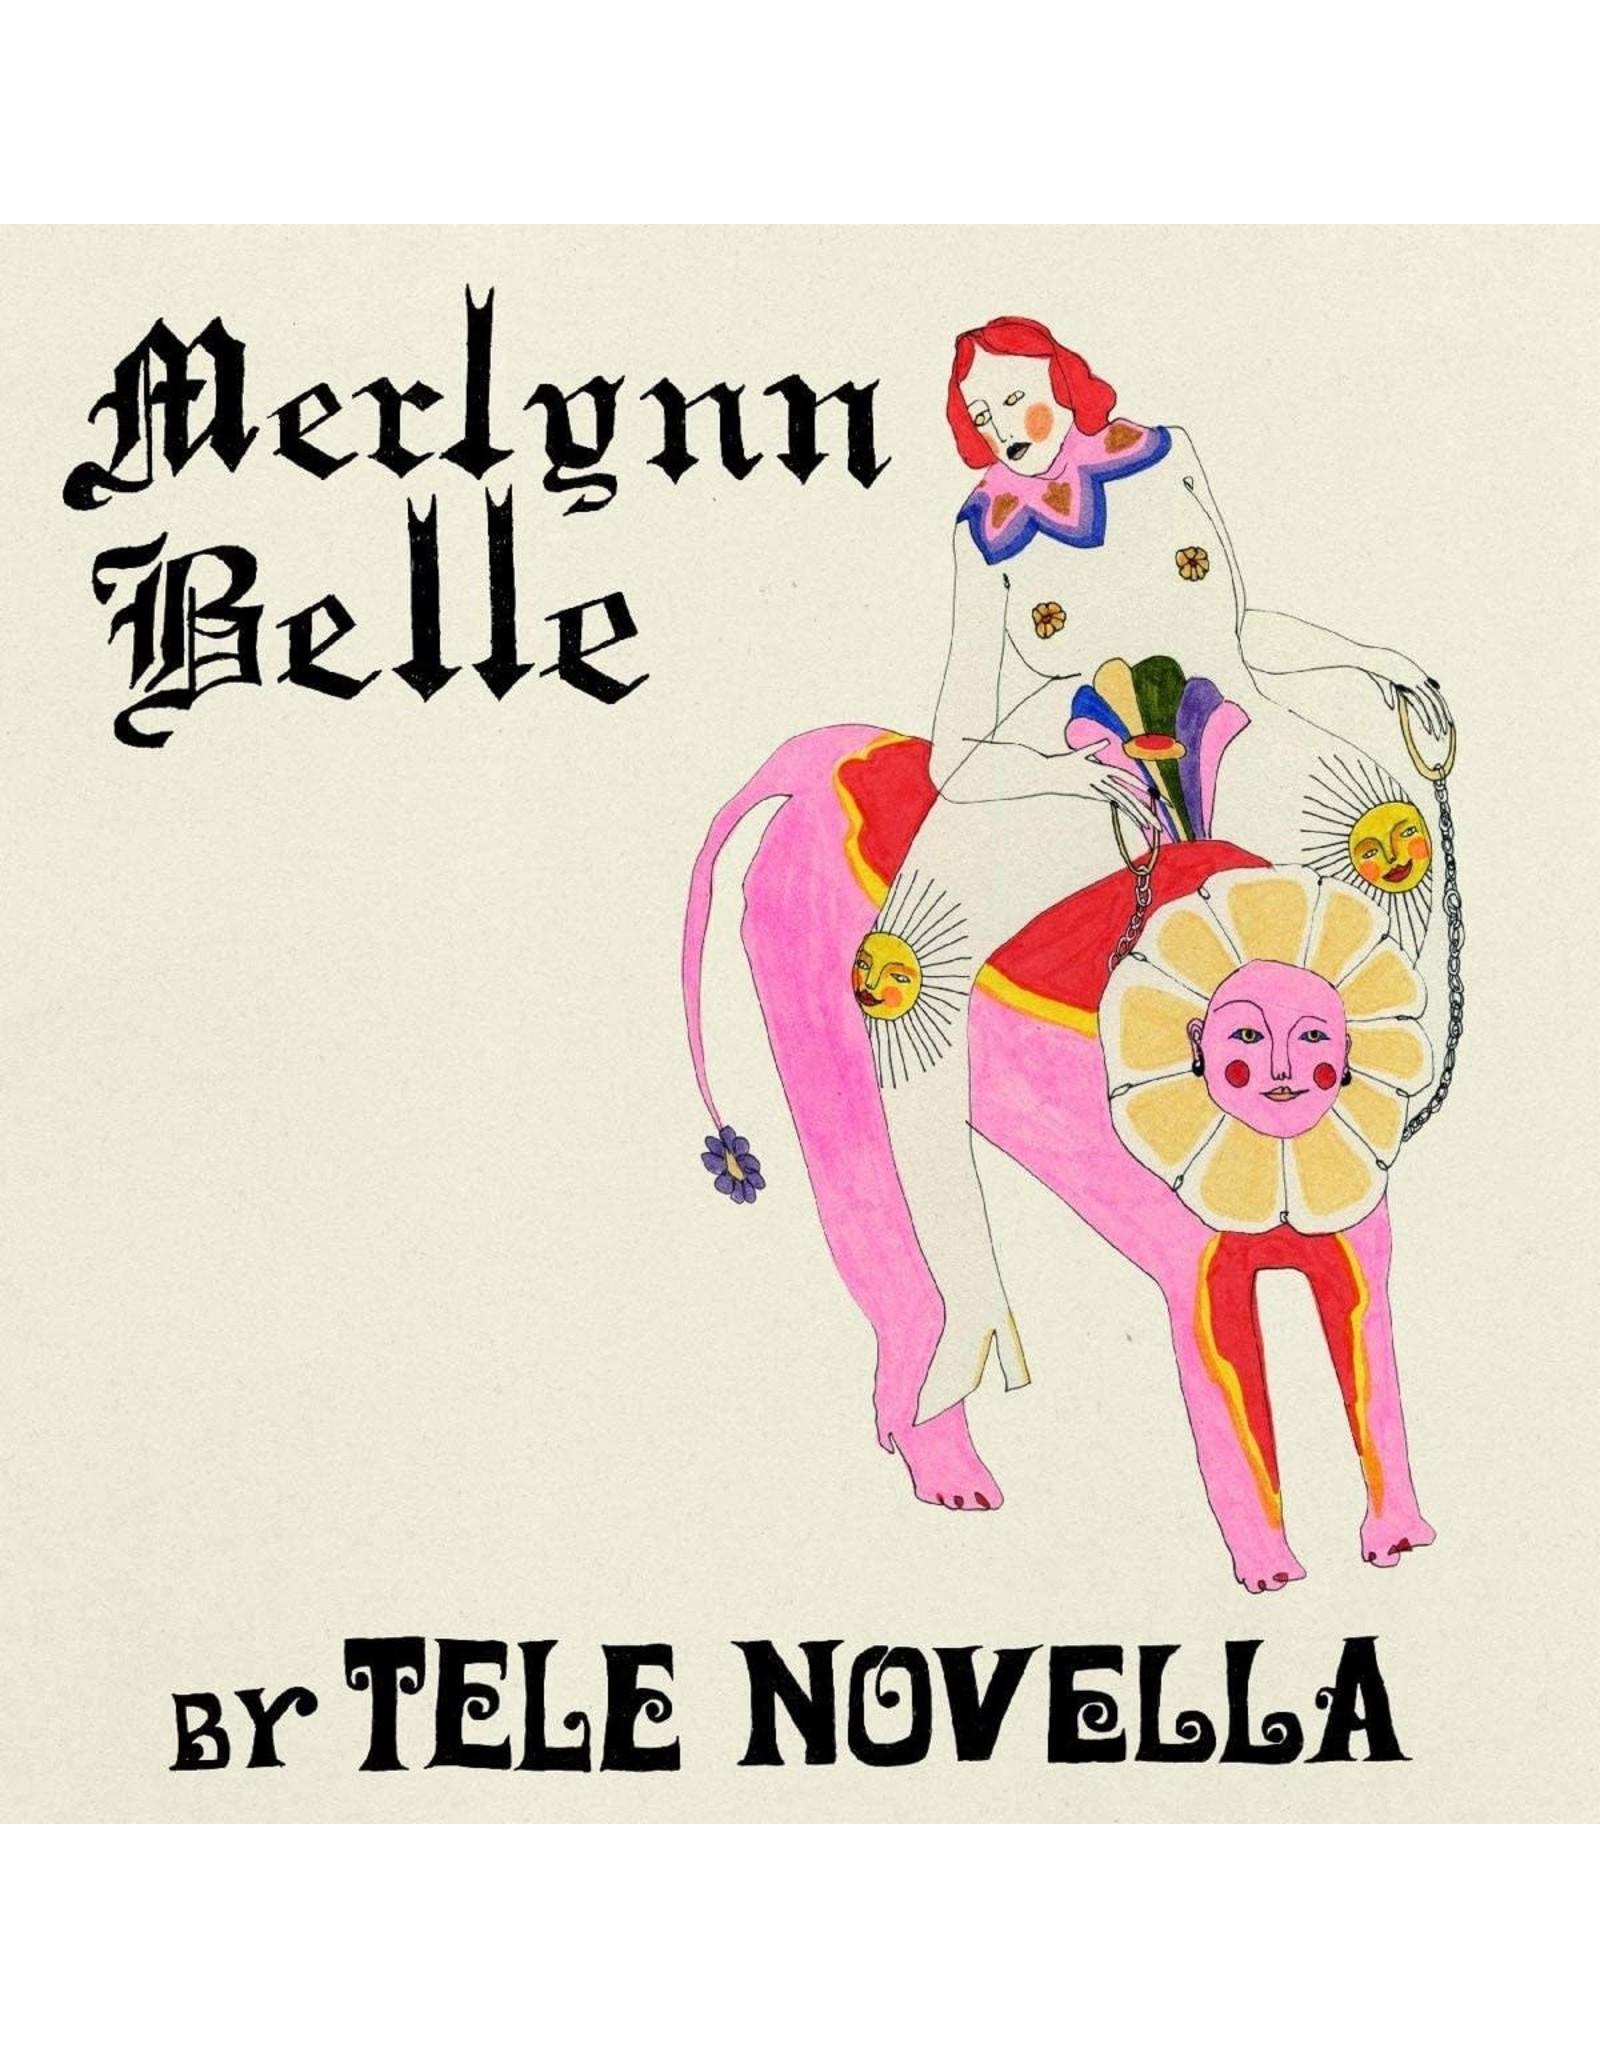 Tele Novella - Merlynn Belle (Exclusive Green Vinyl)